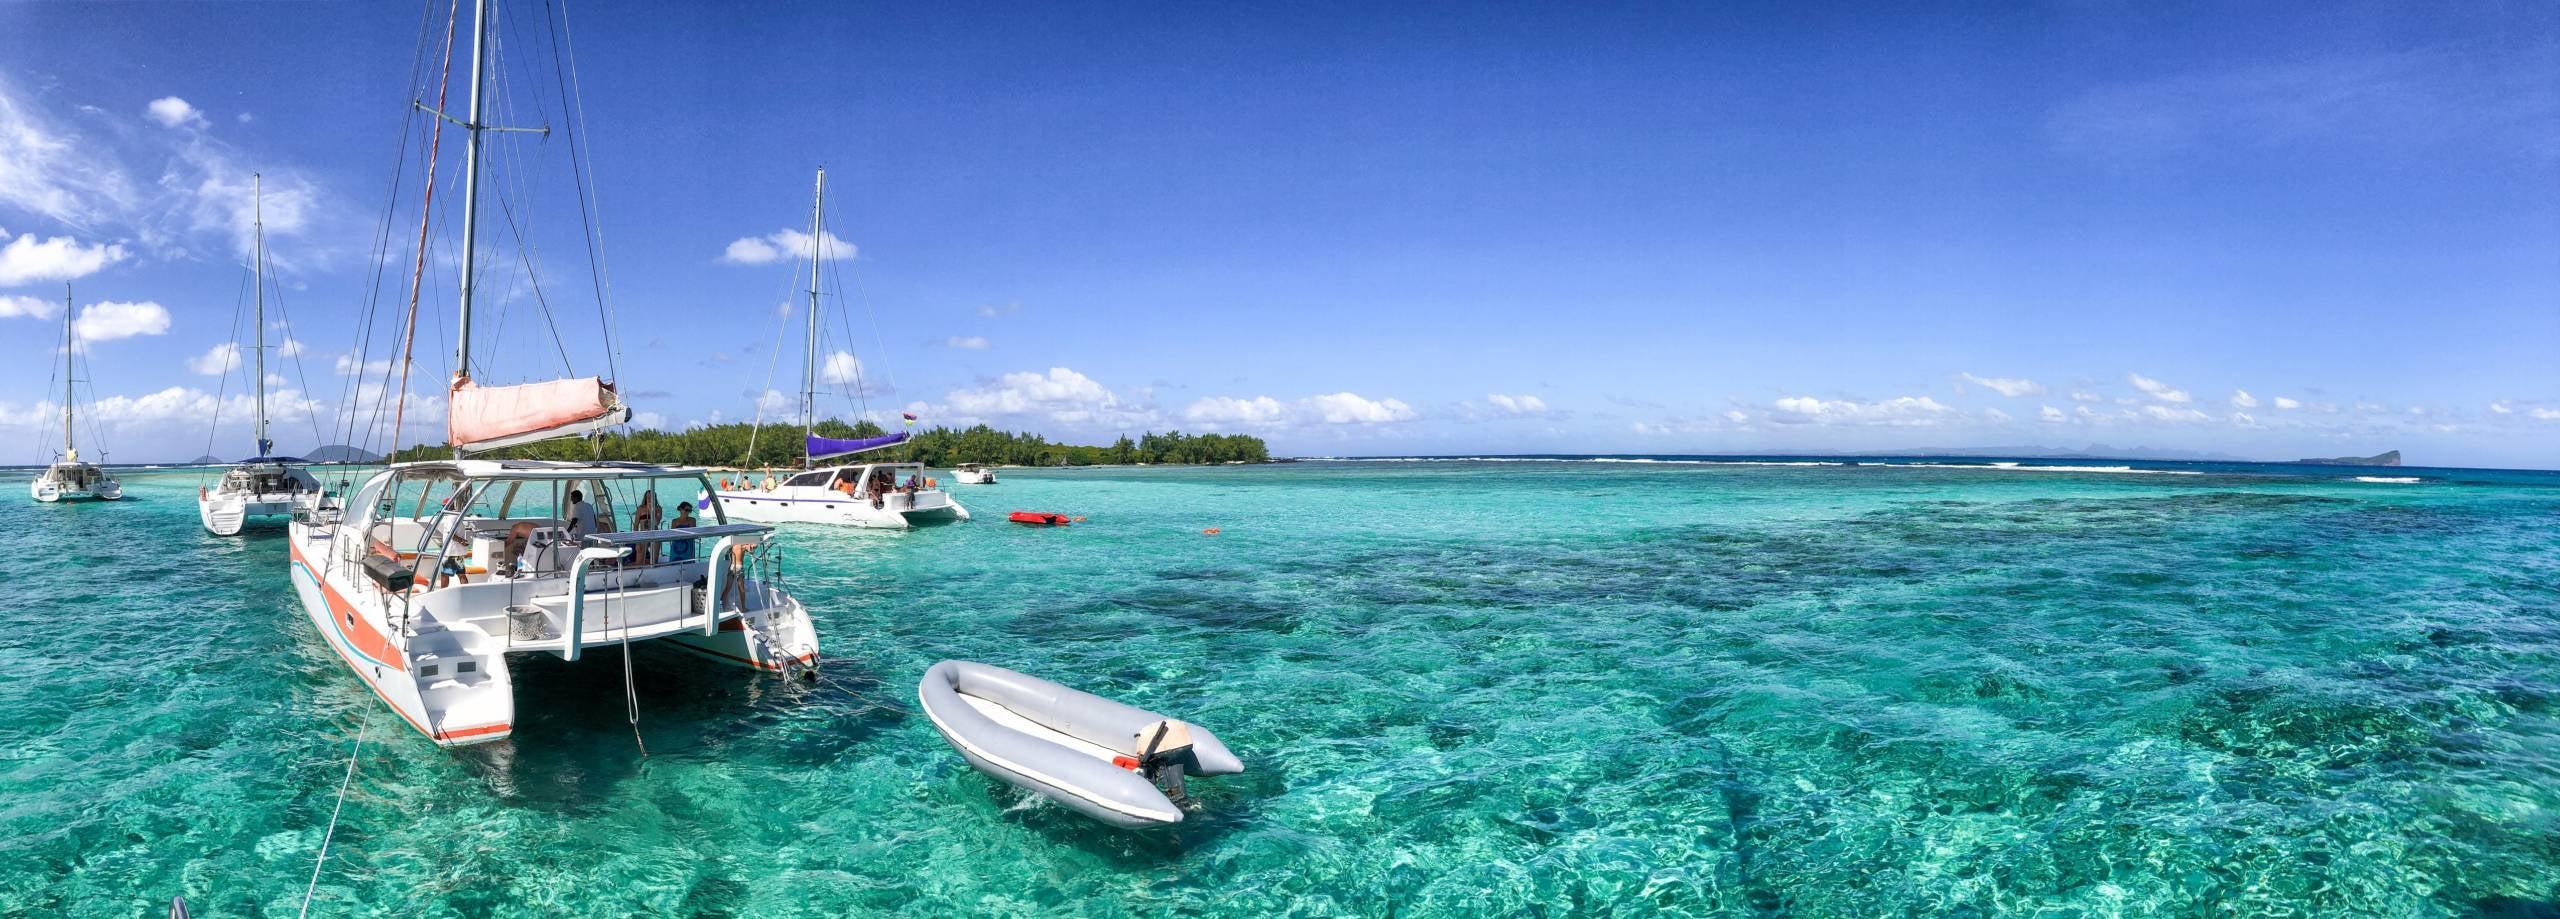 UPDATE: Barbados no longer requiring post-arrival COVID-19 test/quarantine